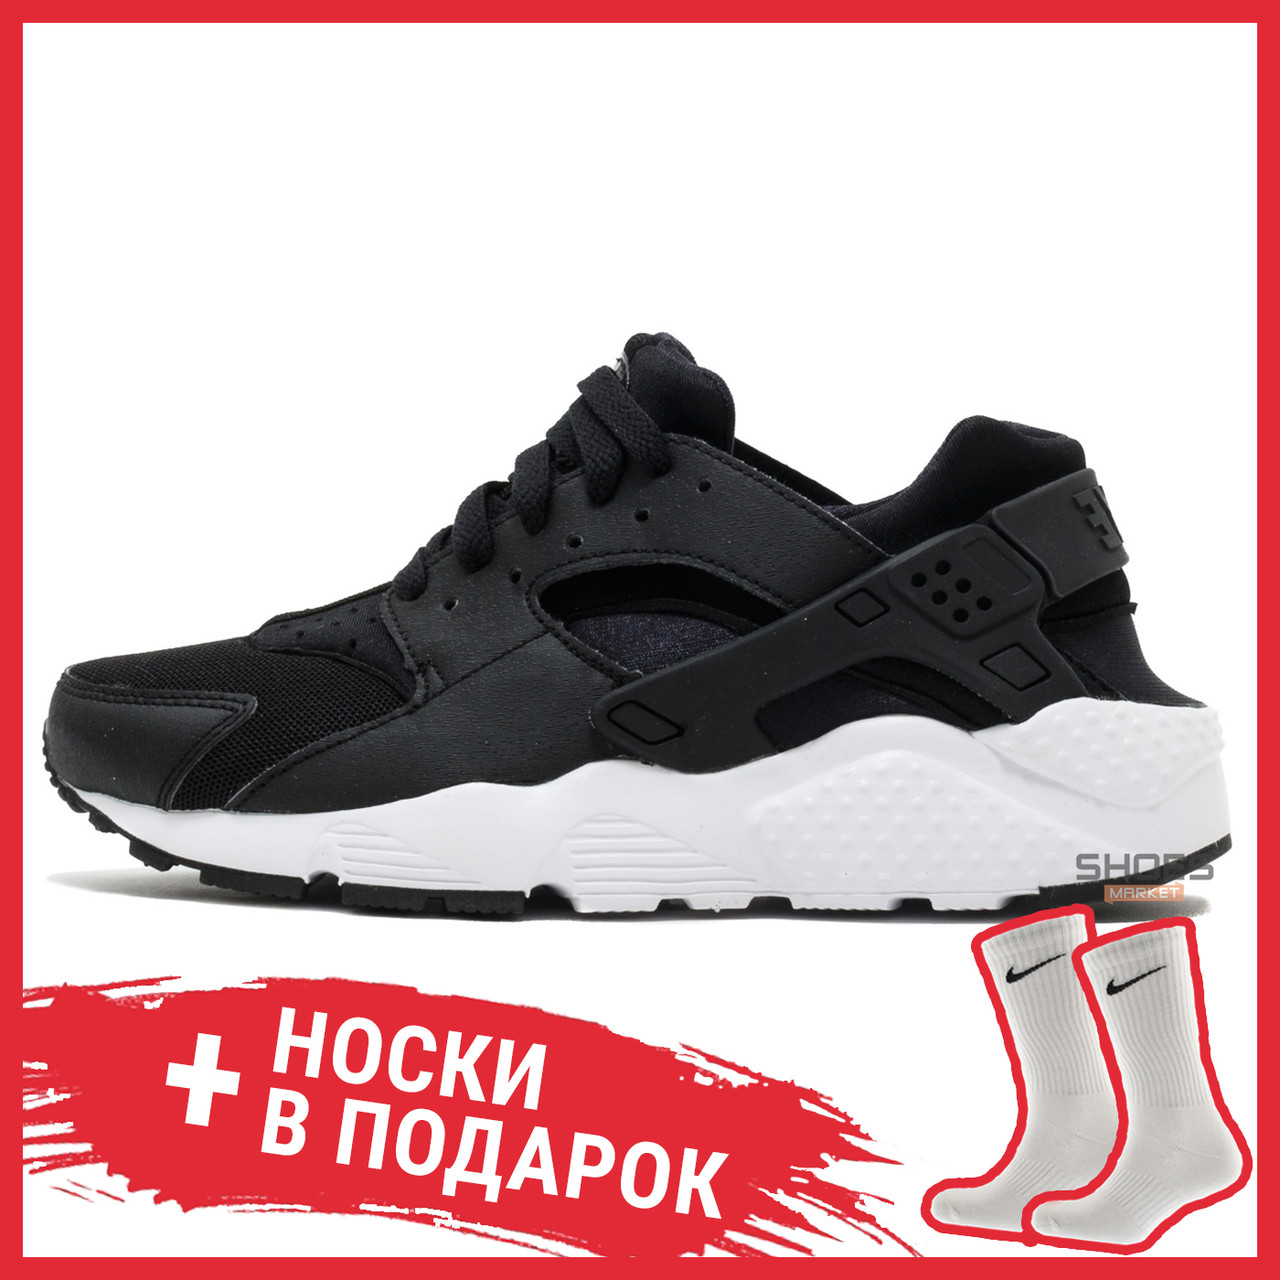 Мужские кроссовки Nike Huarache Run GS 654275-011, Найк Аир Хуарачи